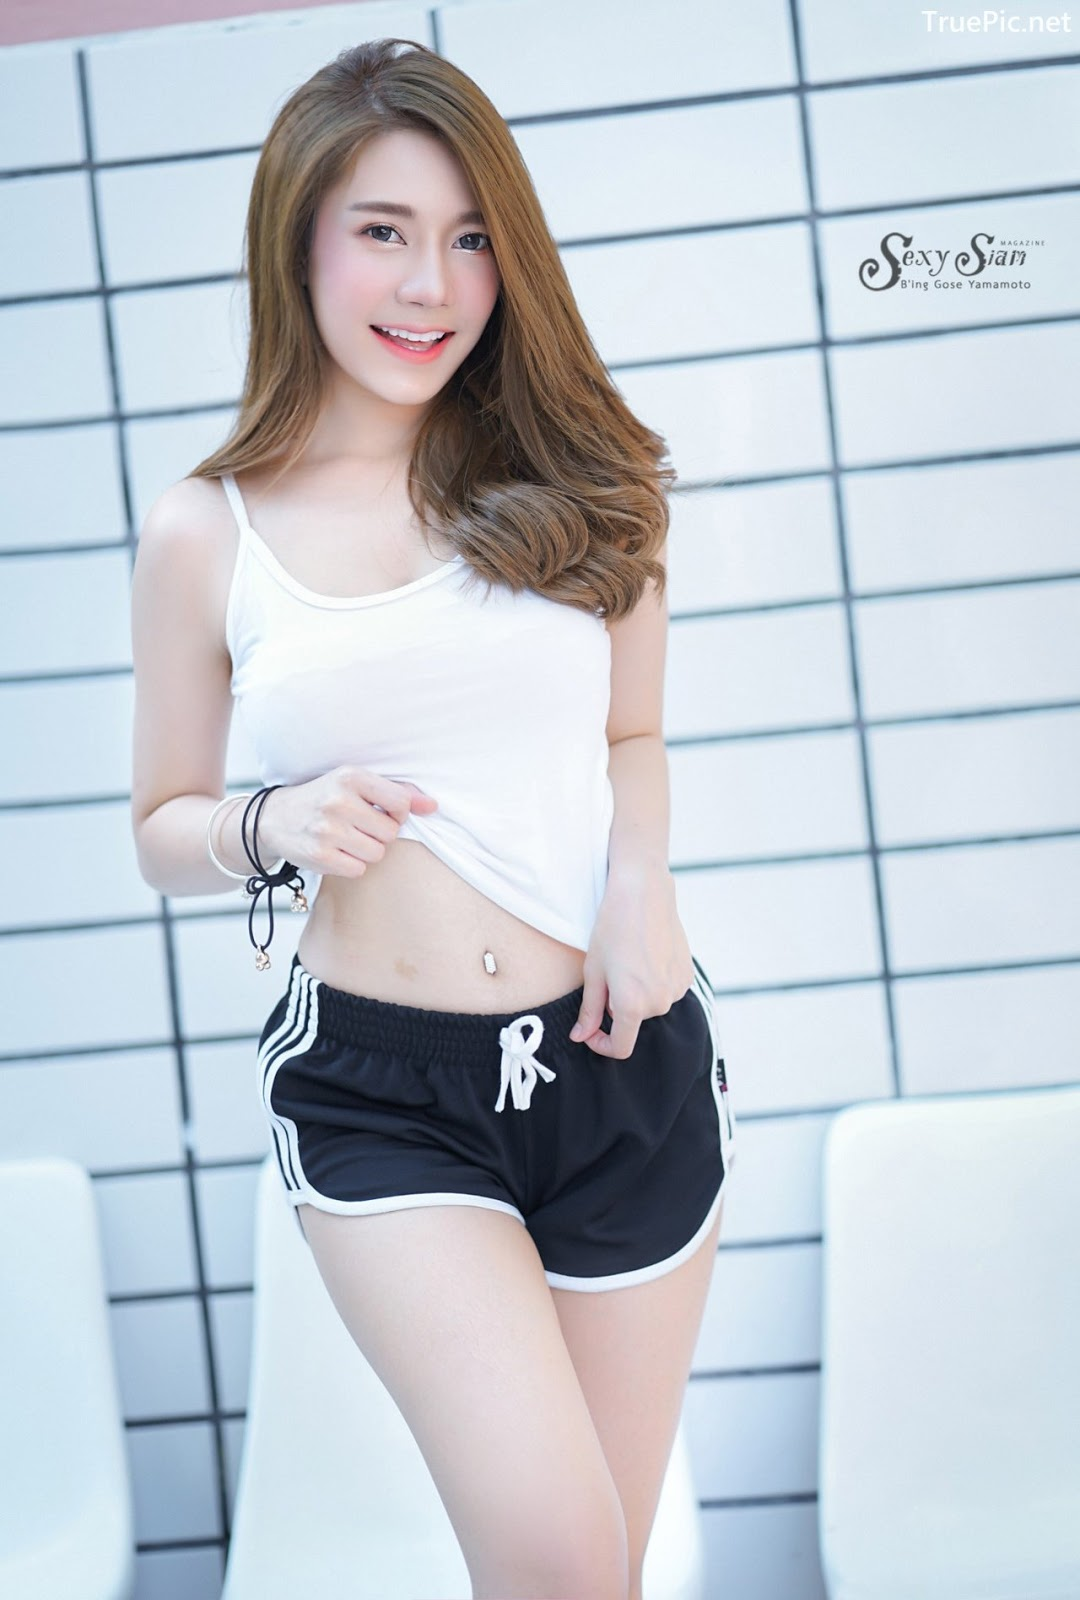 Image Thailand Model - Sasipa Tungmay Jibkrapong - White Crop Top - TruePic.net - Picture-9